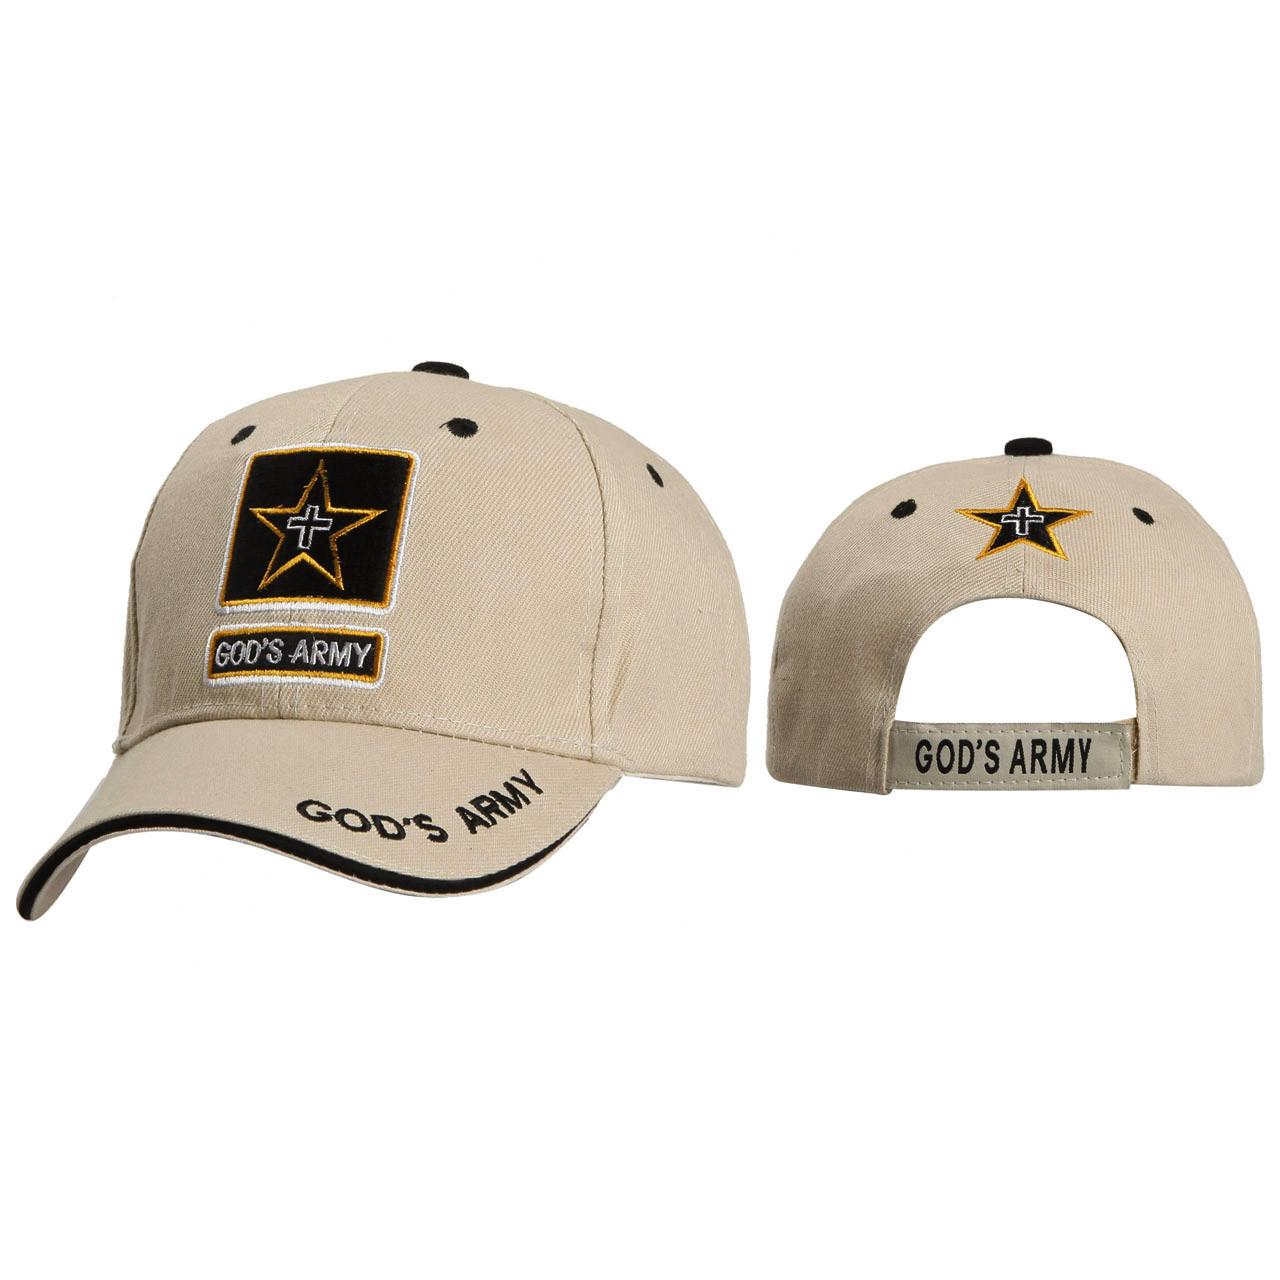 Christian Caps Wholesale C109 ~ God's Army ~ Beige